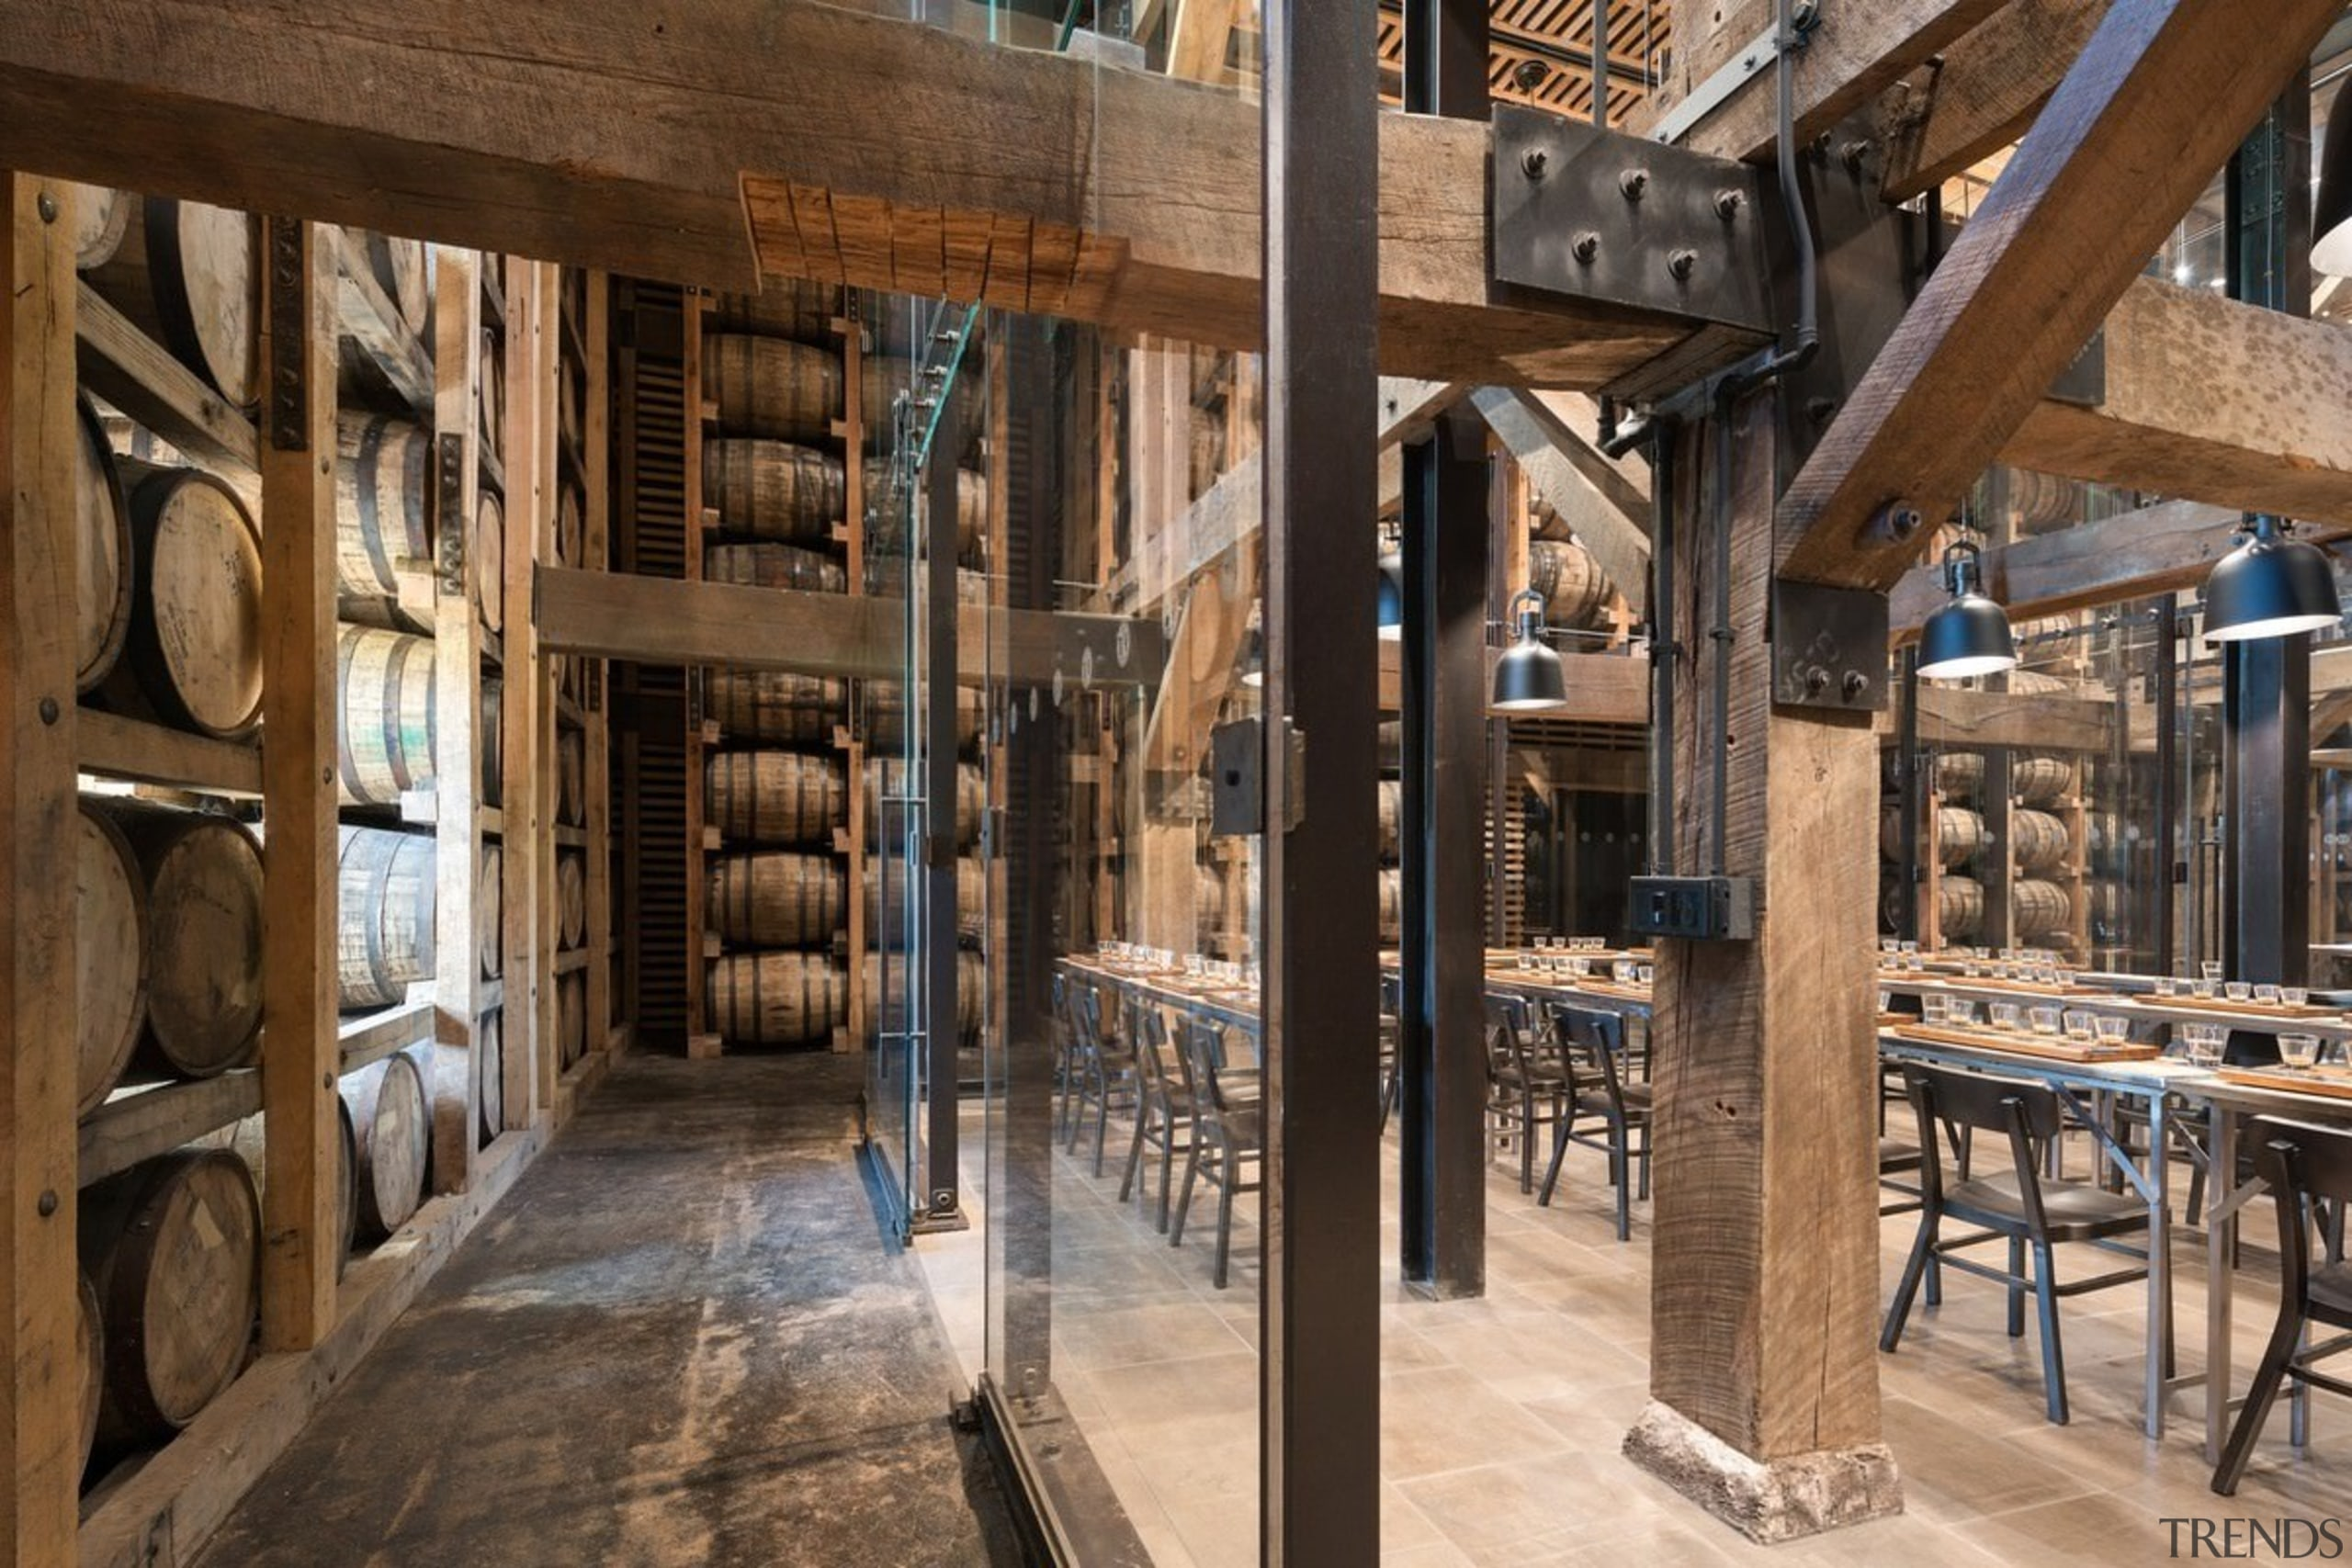 Barrel house - Barrel house - interior design interior design, wood, brown